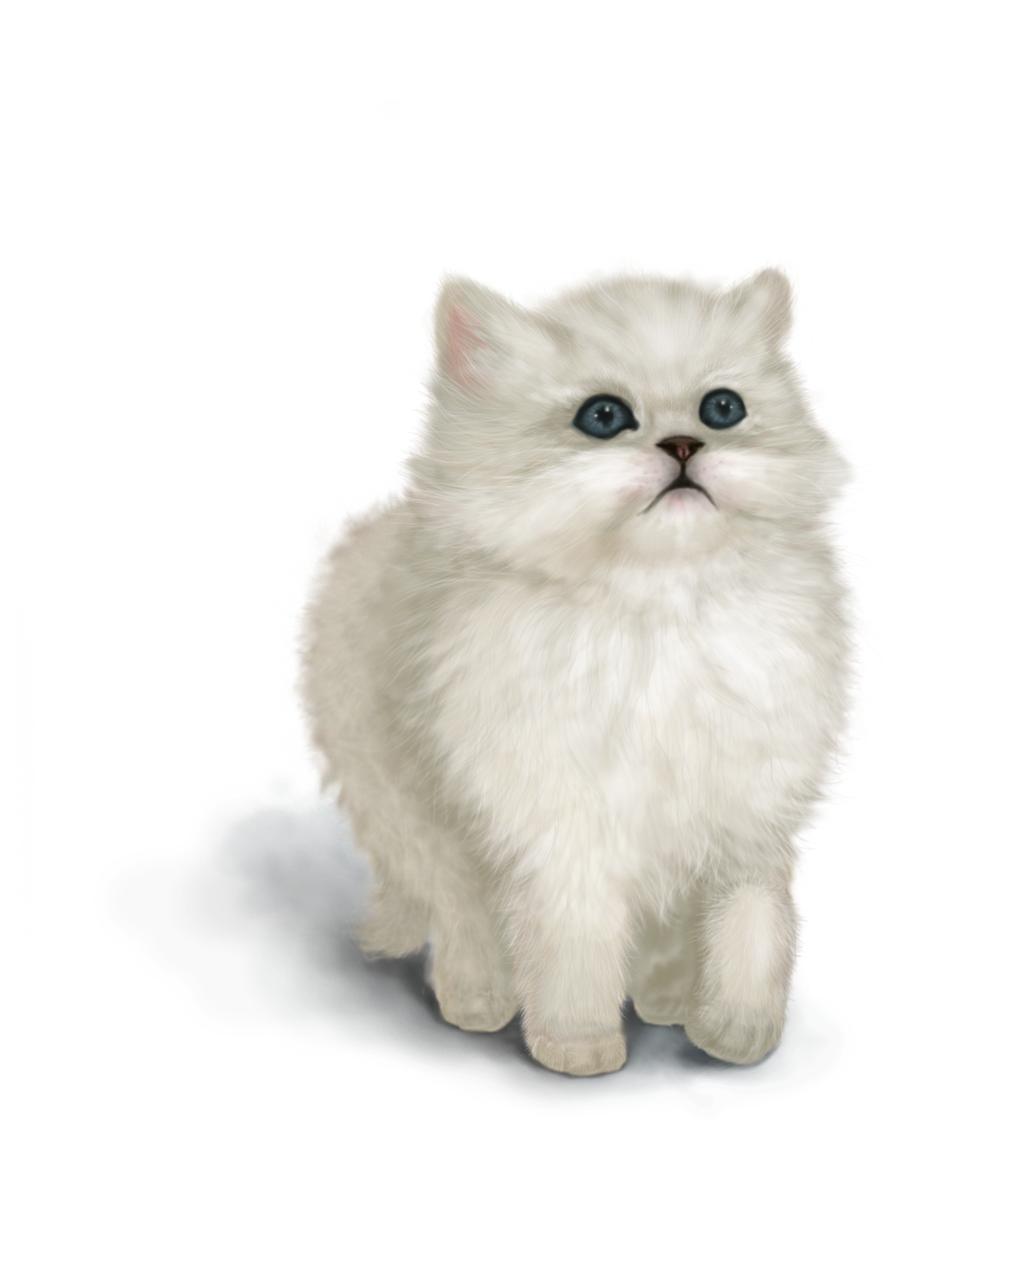 Curious Kitten by anastasia0829